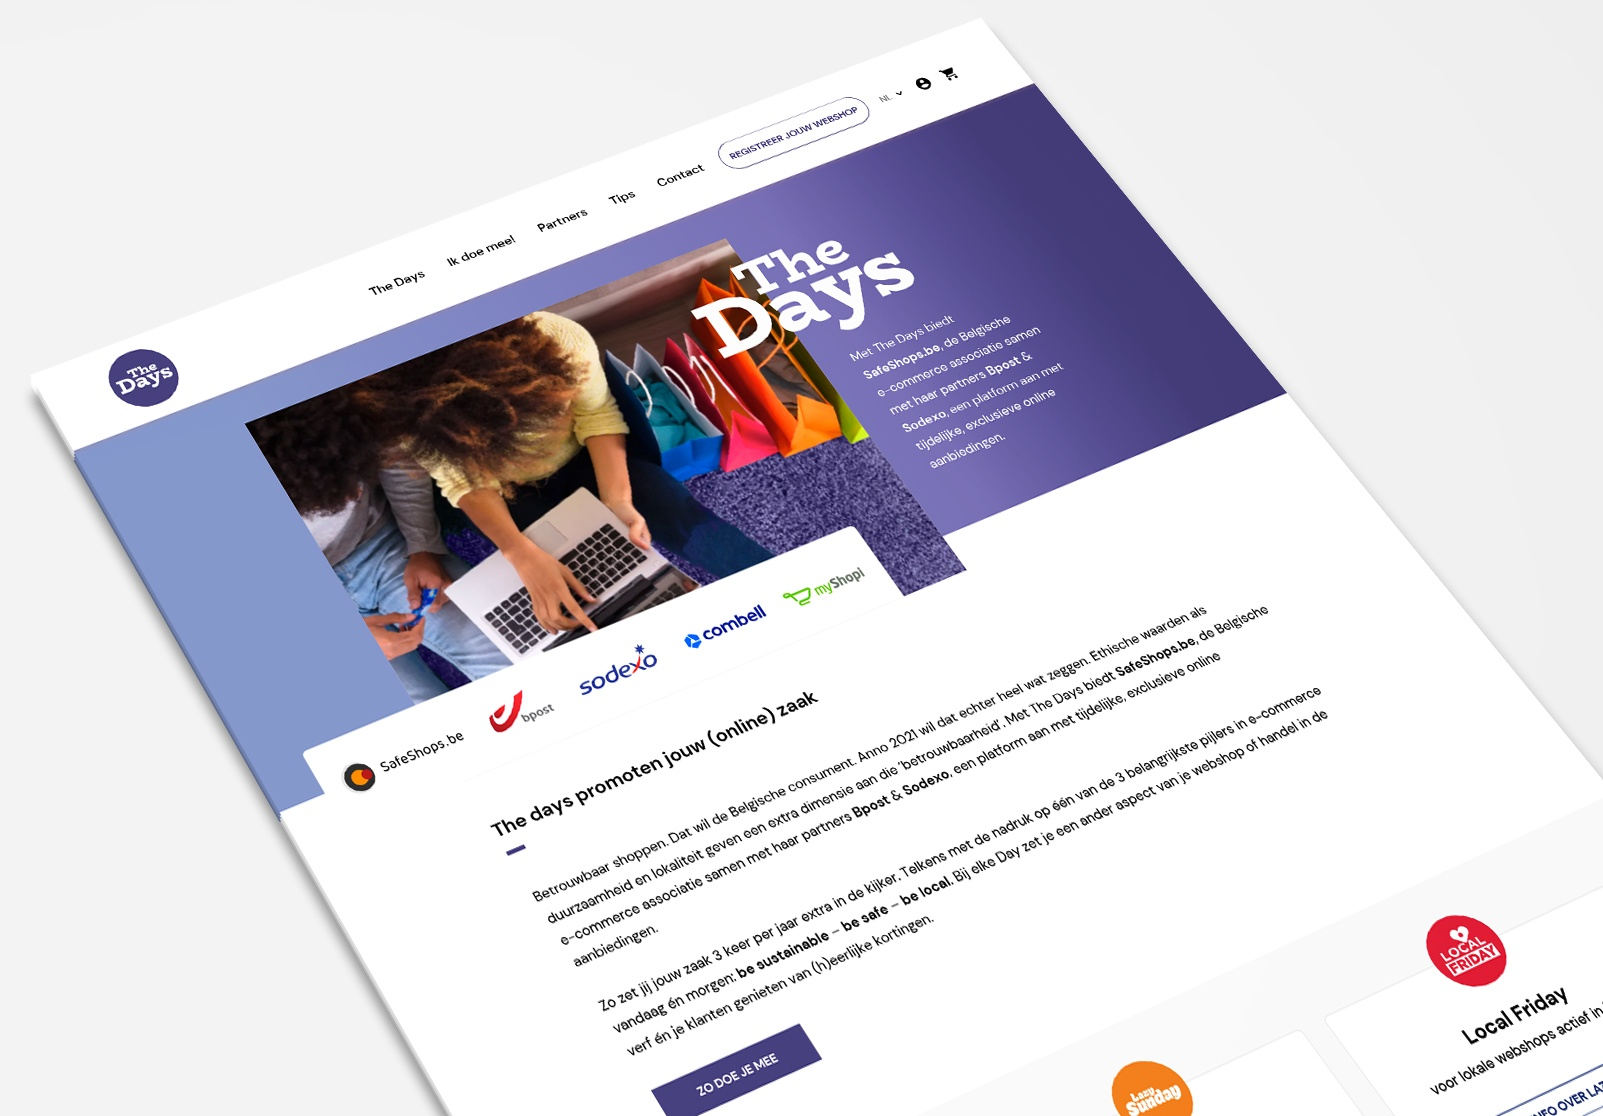 The Days Website